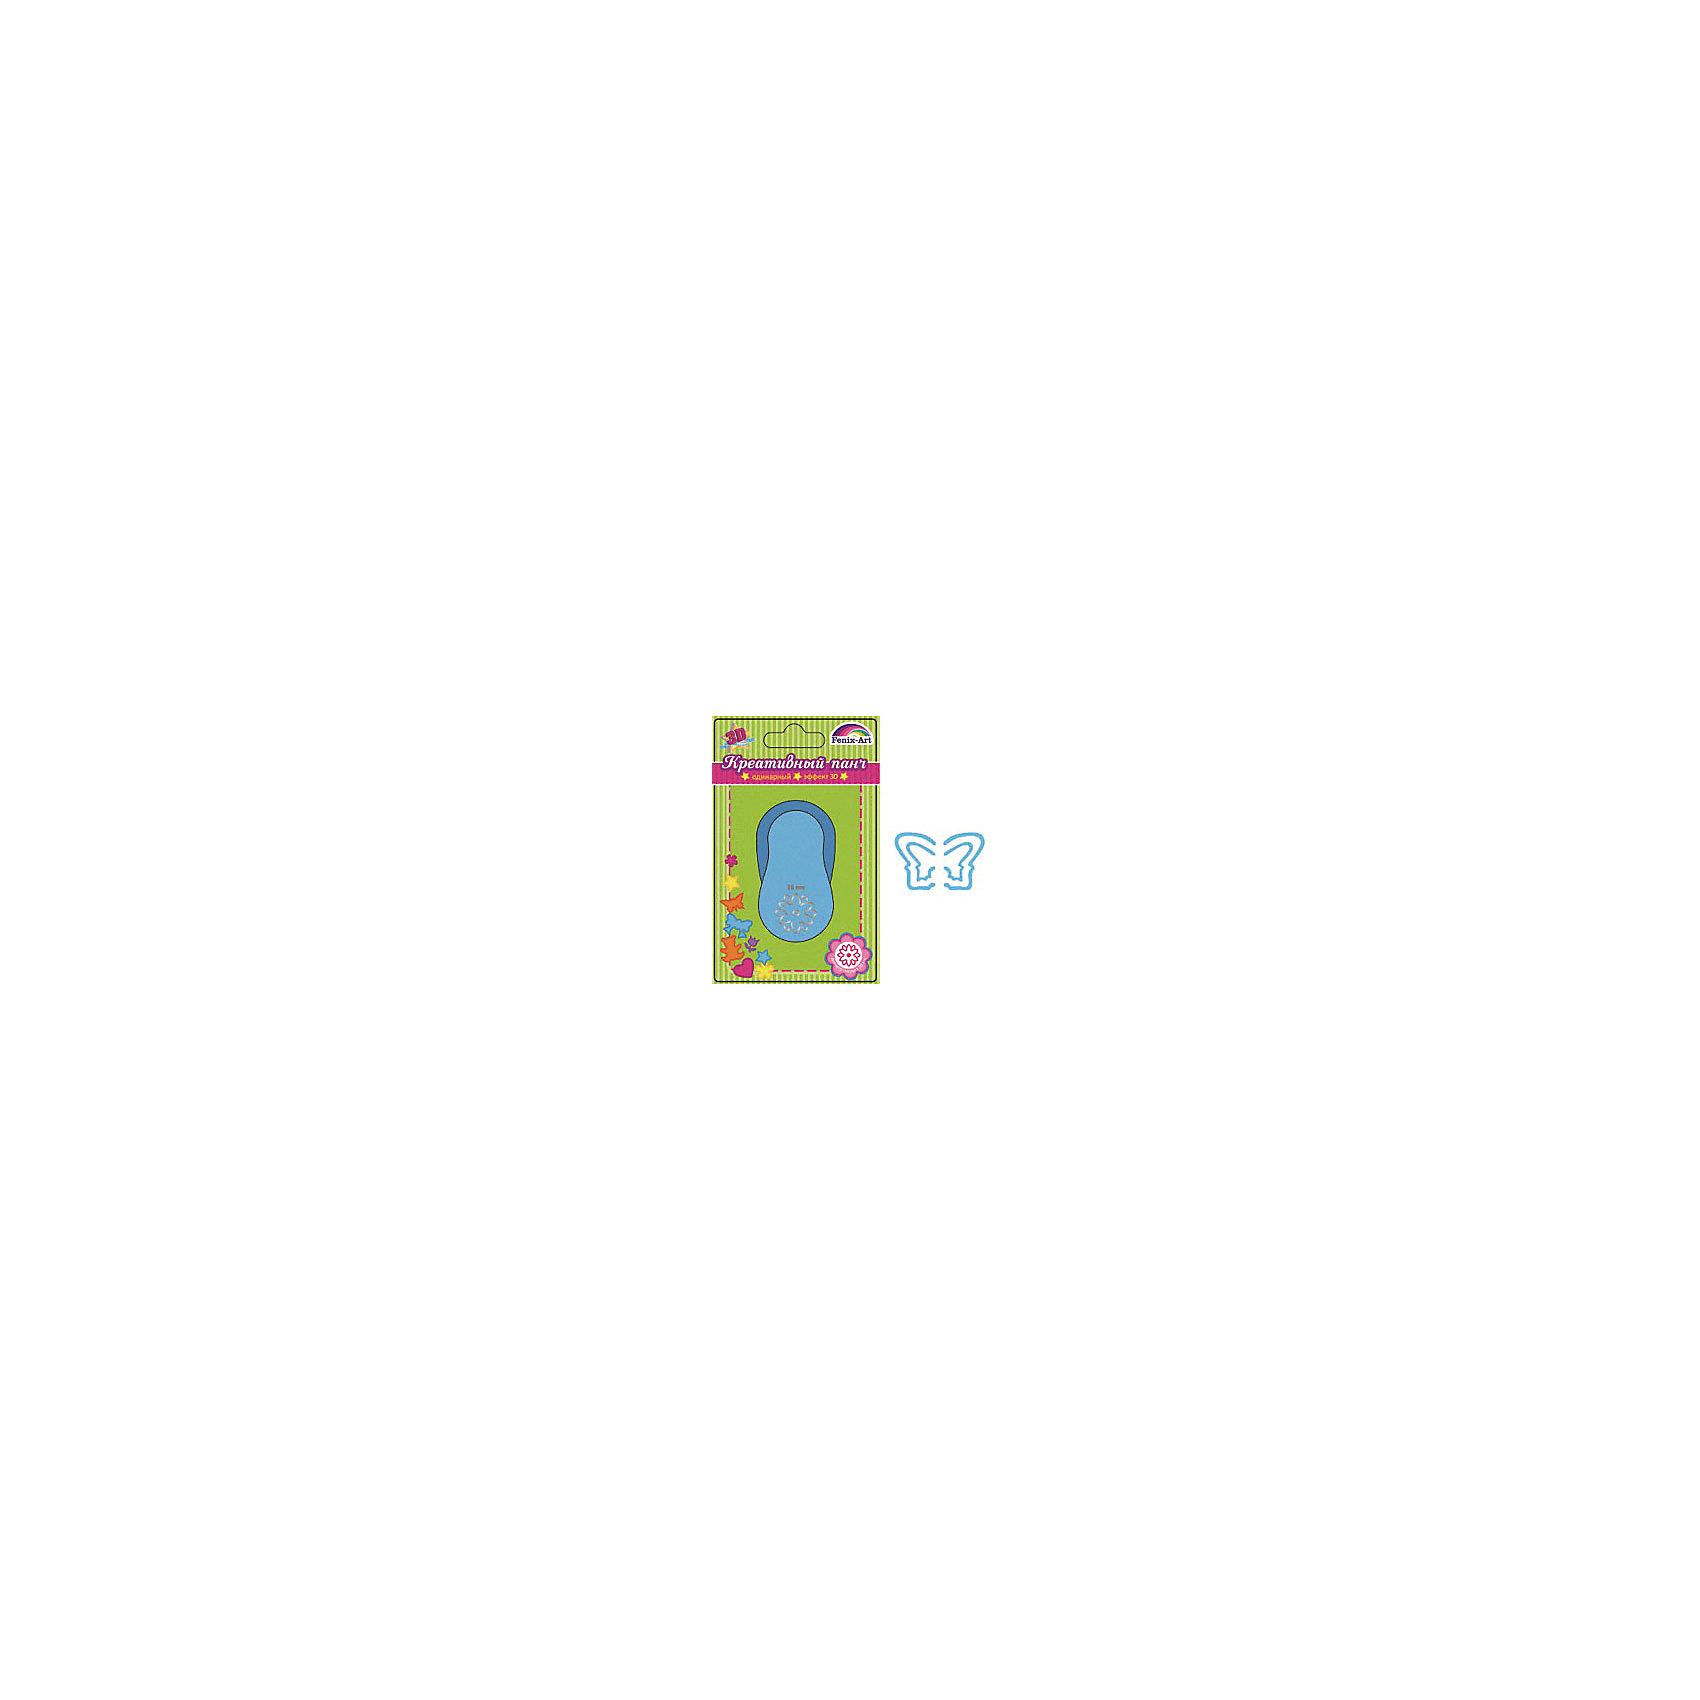 Панч-дырокол одинарный 38 мм Бабочка Феникс+Бумага<br>Панч-дырокол одинарный БАБОЧКА/38 (размер рисунка 38мм, размер панча 73х45х57, эффект 3D, голубой цвет, в блистере)<br><br>Ширина мм: 160<br>Глубина мм: 100<br>Высота мм: 75<br>Вес г: 215<br>Возраст от месяцев: 72<br>Возраст до месяцев: 2147483647<br>Пол: Унисекс<br>Возраст: Детский<br>SKU: 7046280